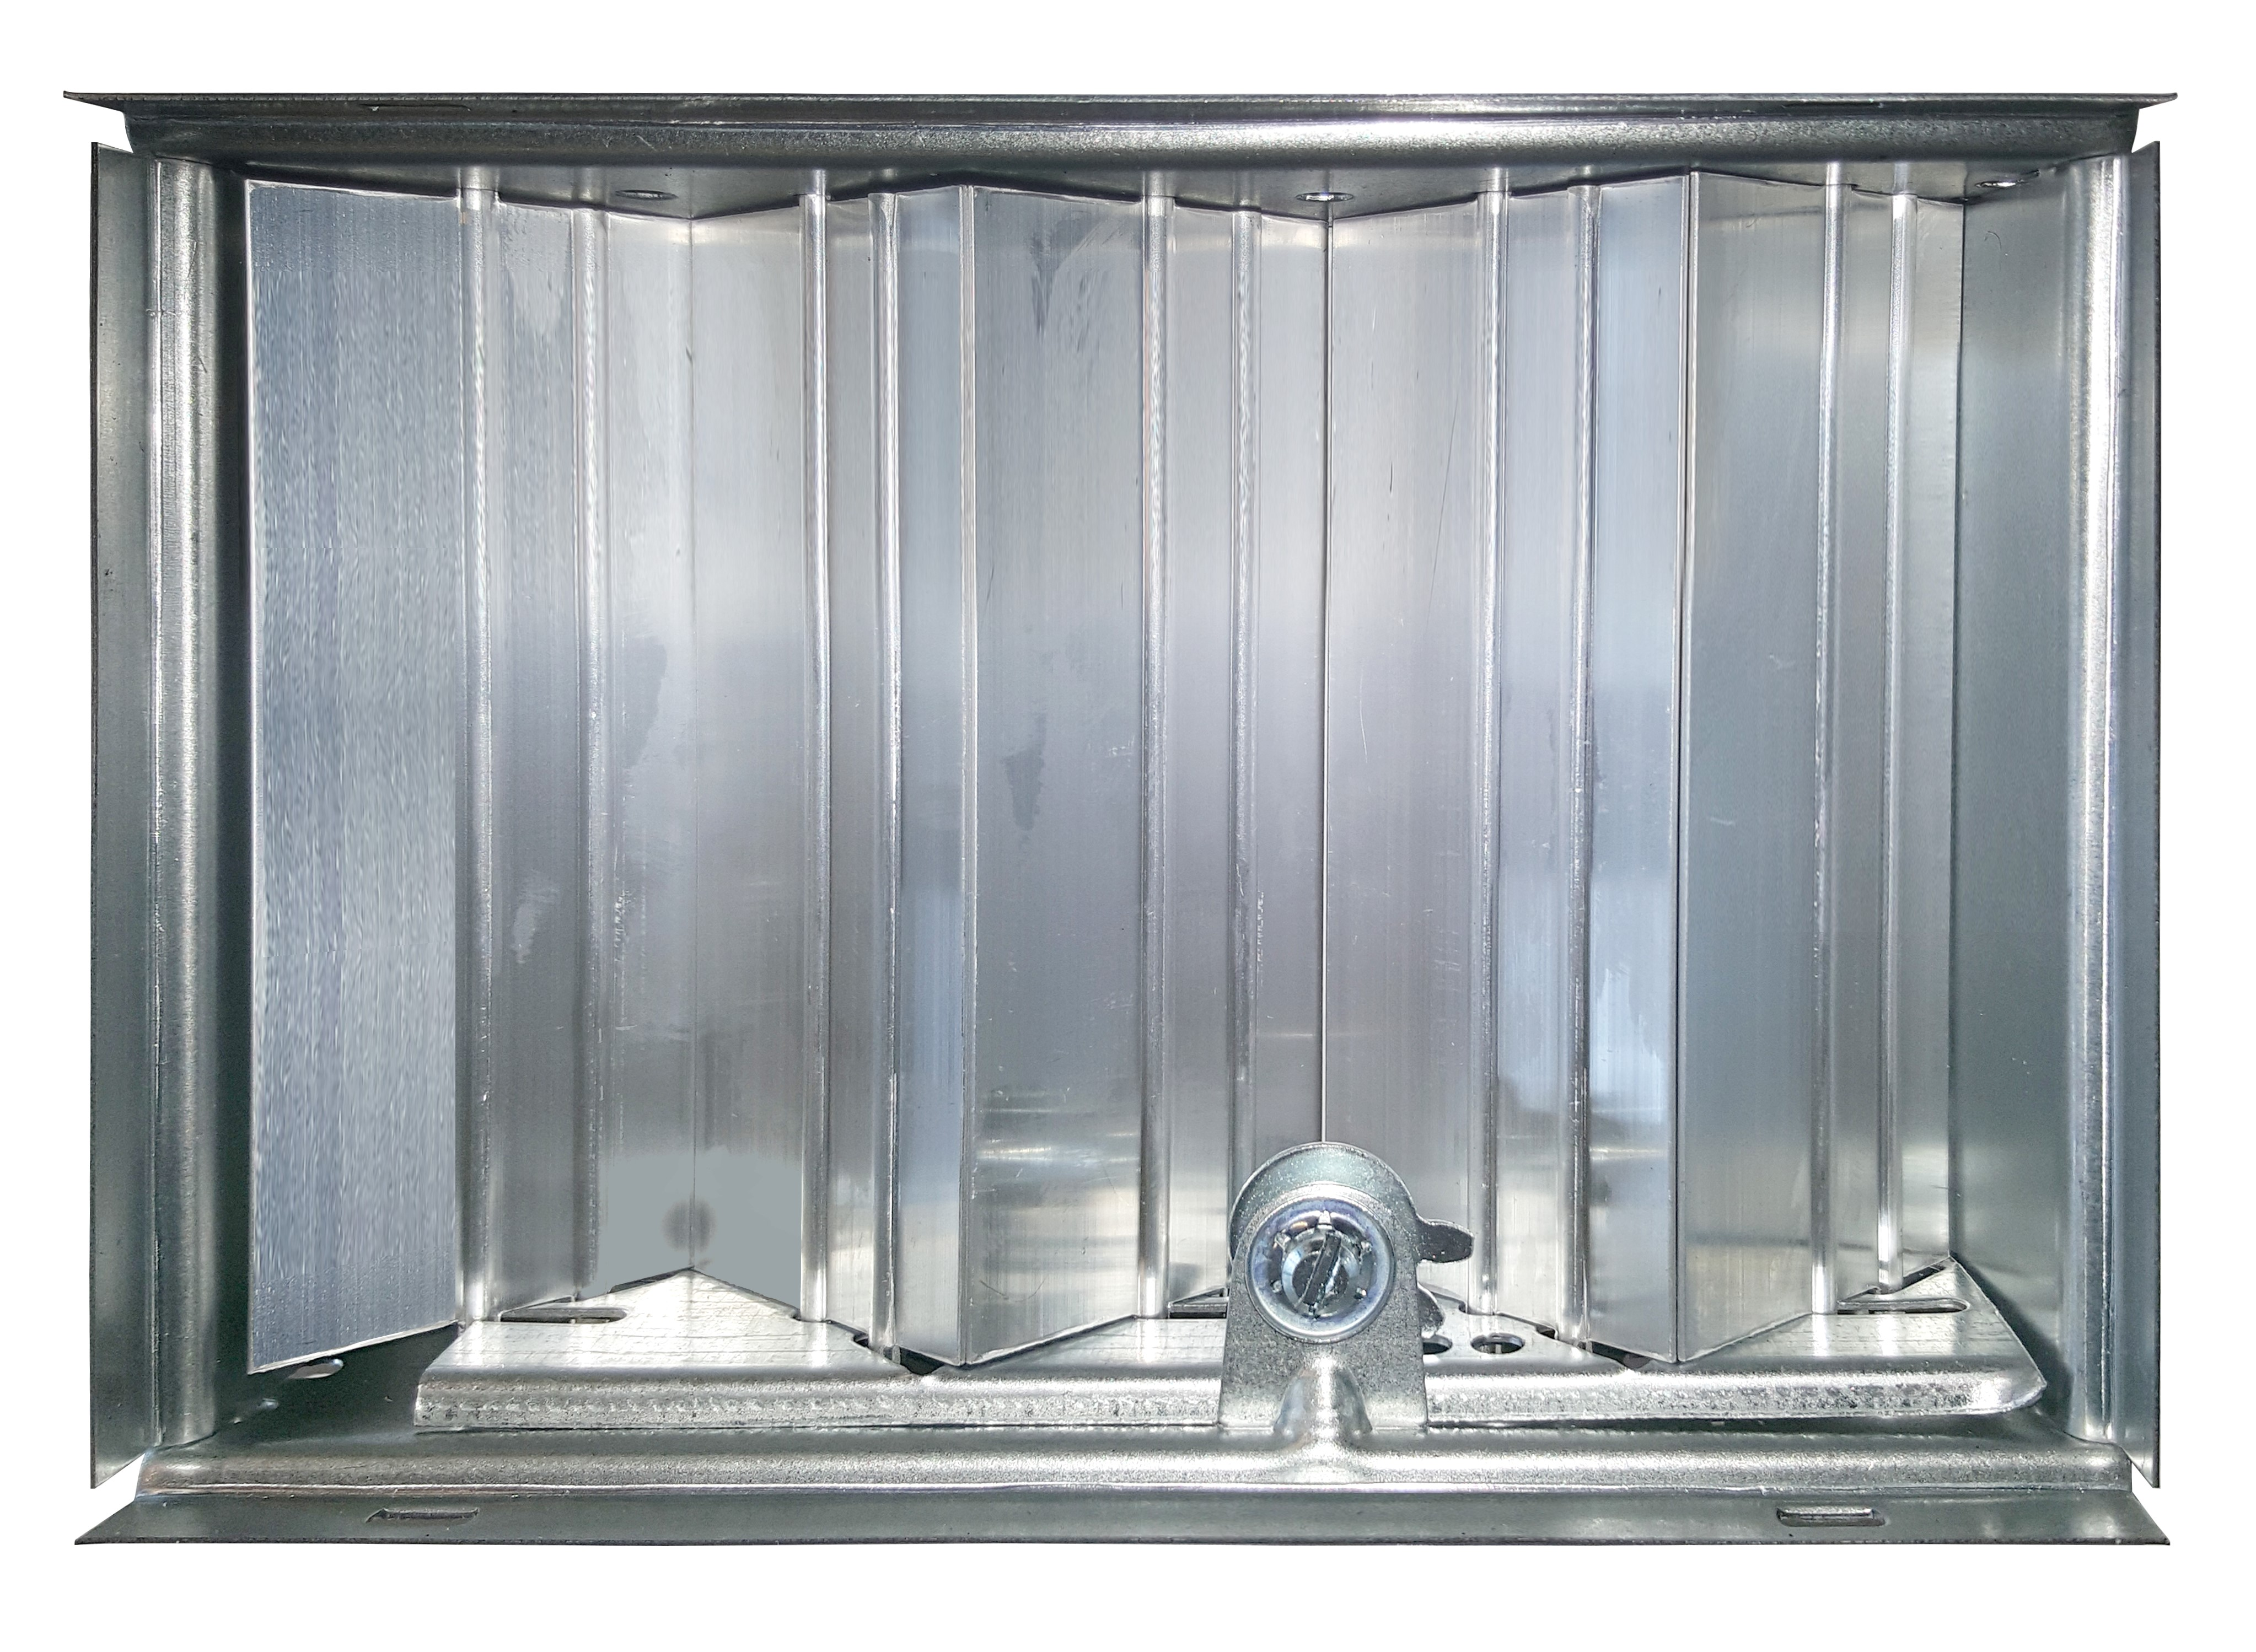 Serranda di regolazione a contrasto per bocchette dimensione 1000x150 mm serie BBMA/BGRA